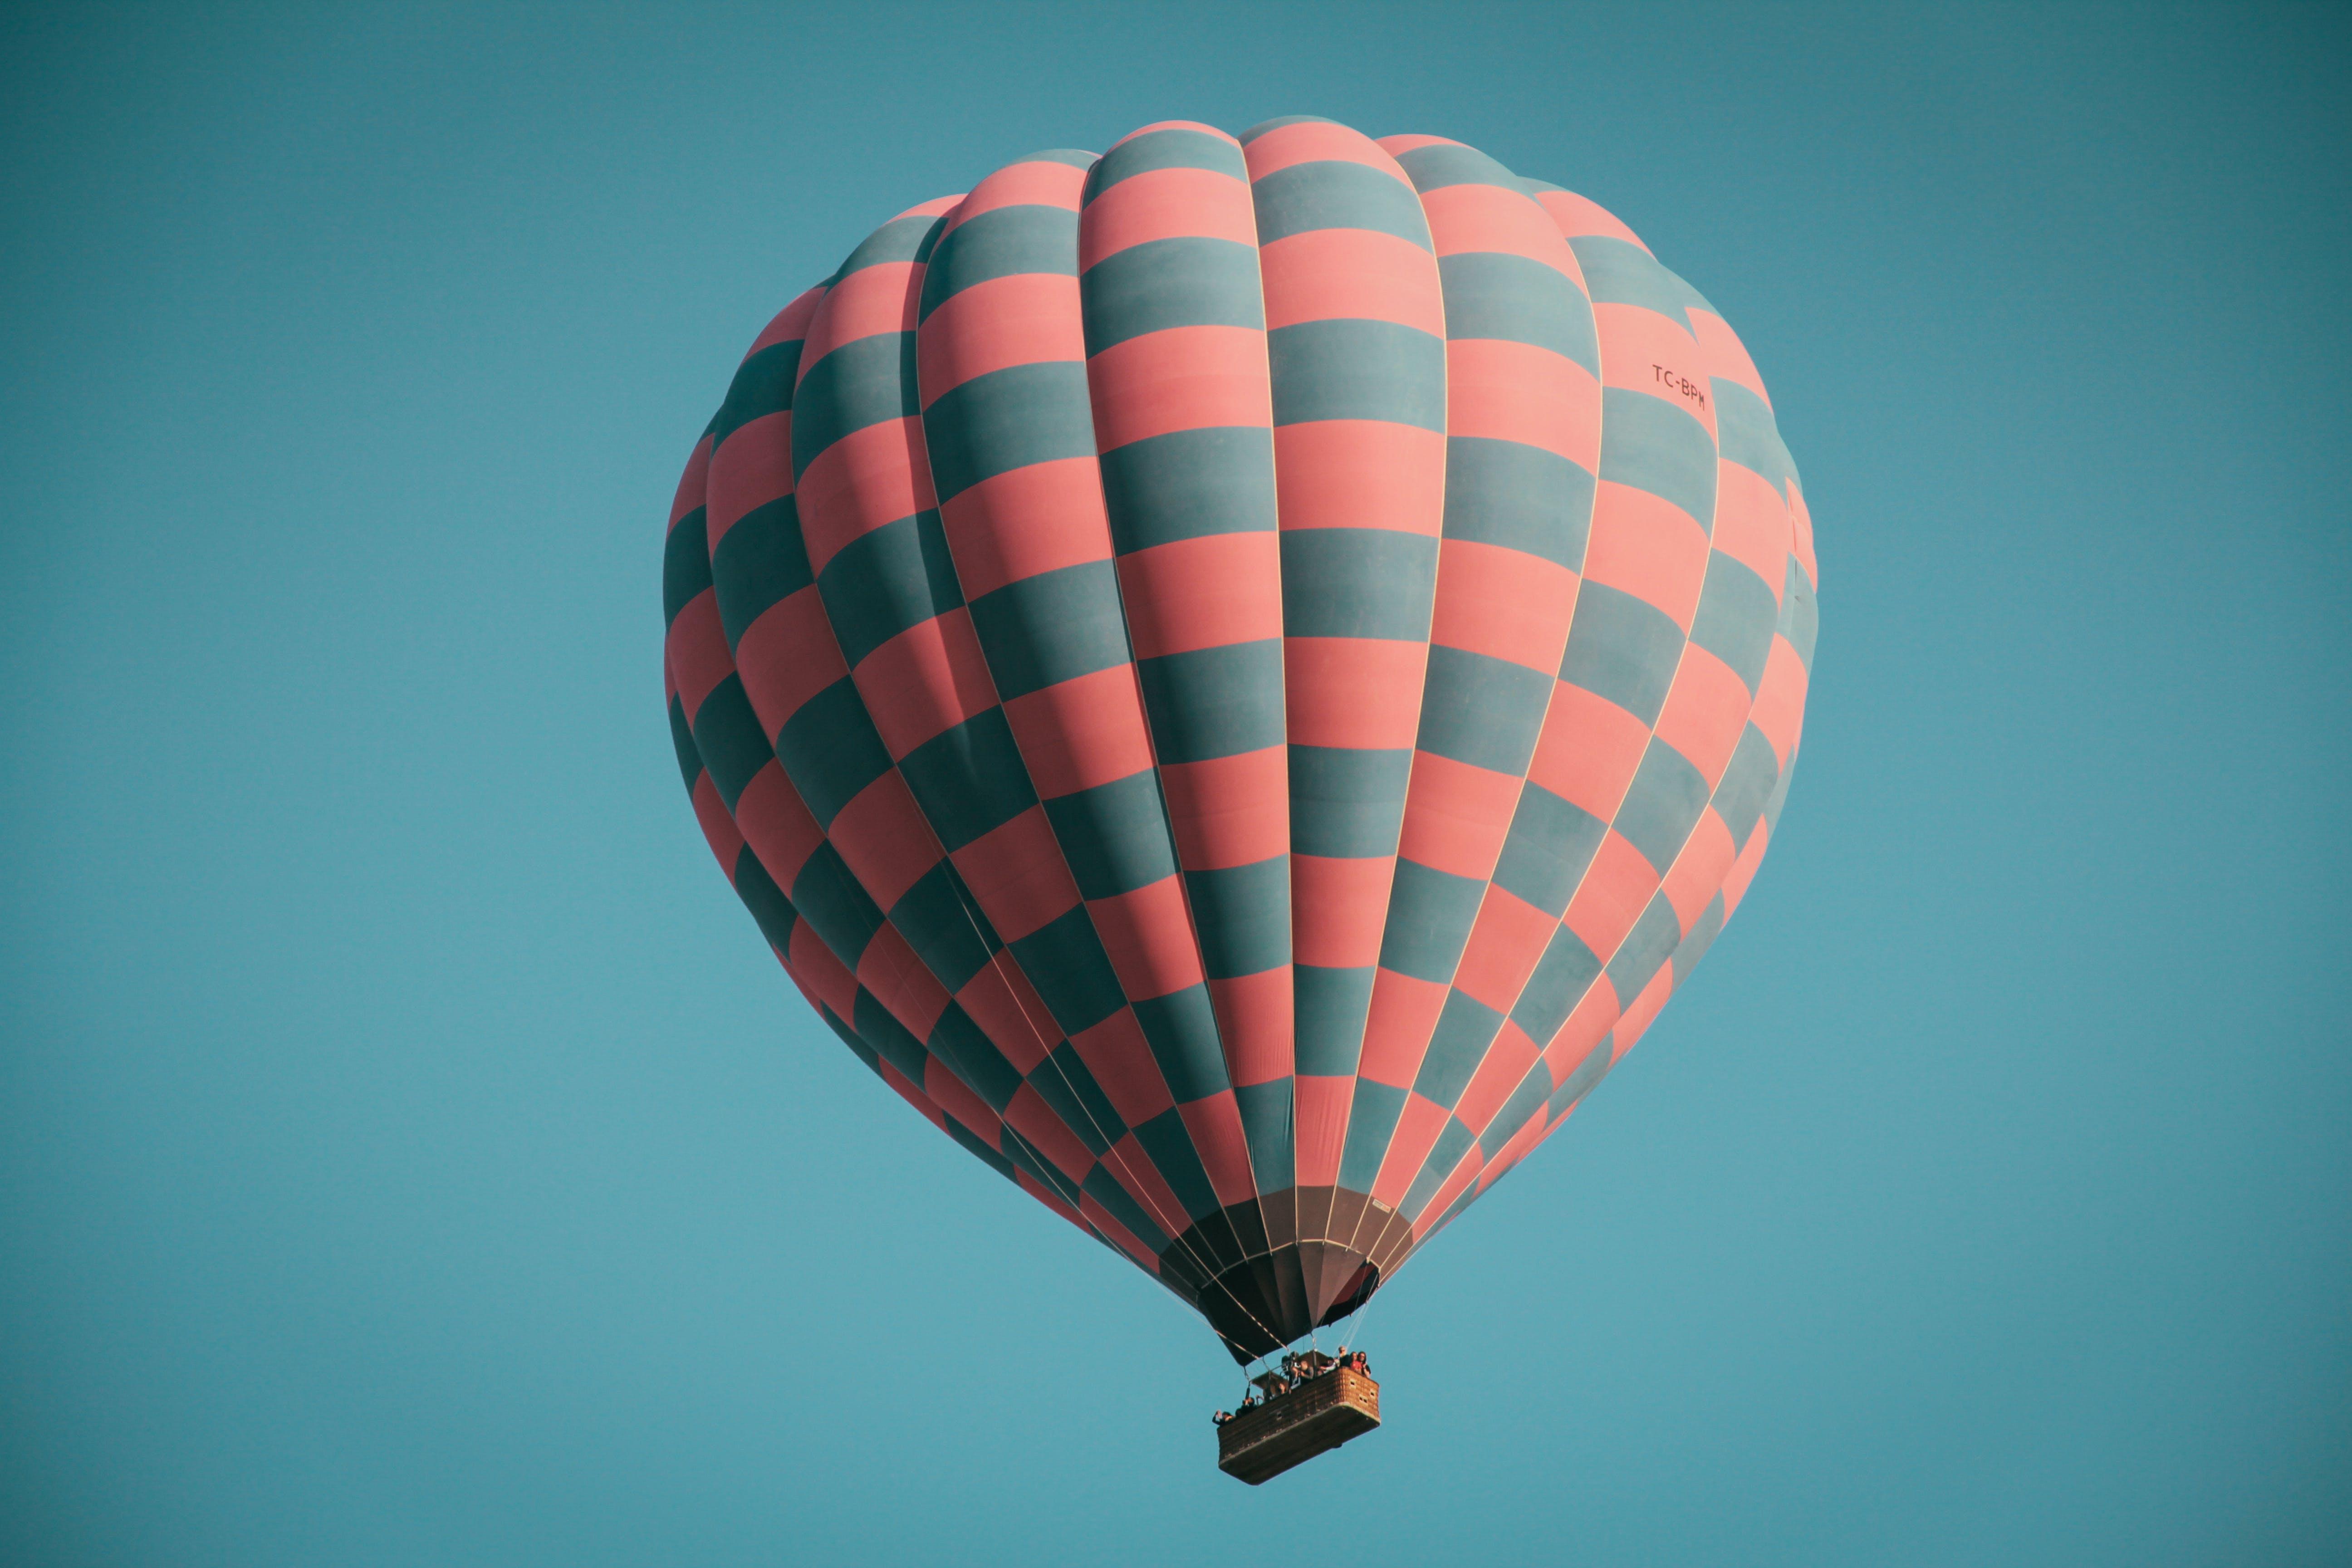 Low Angle Photo of Hot Air Balloon